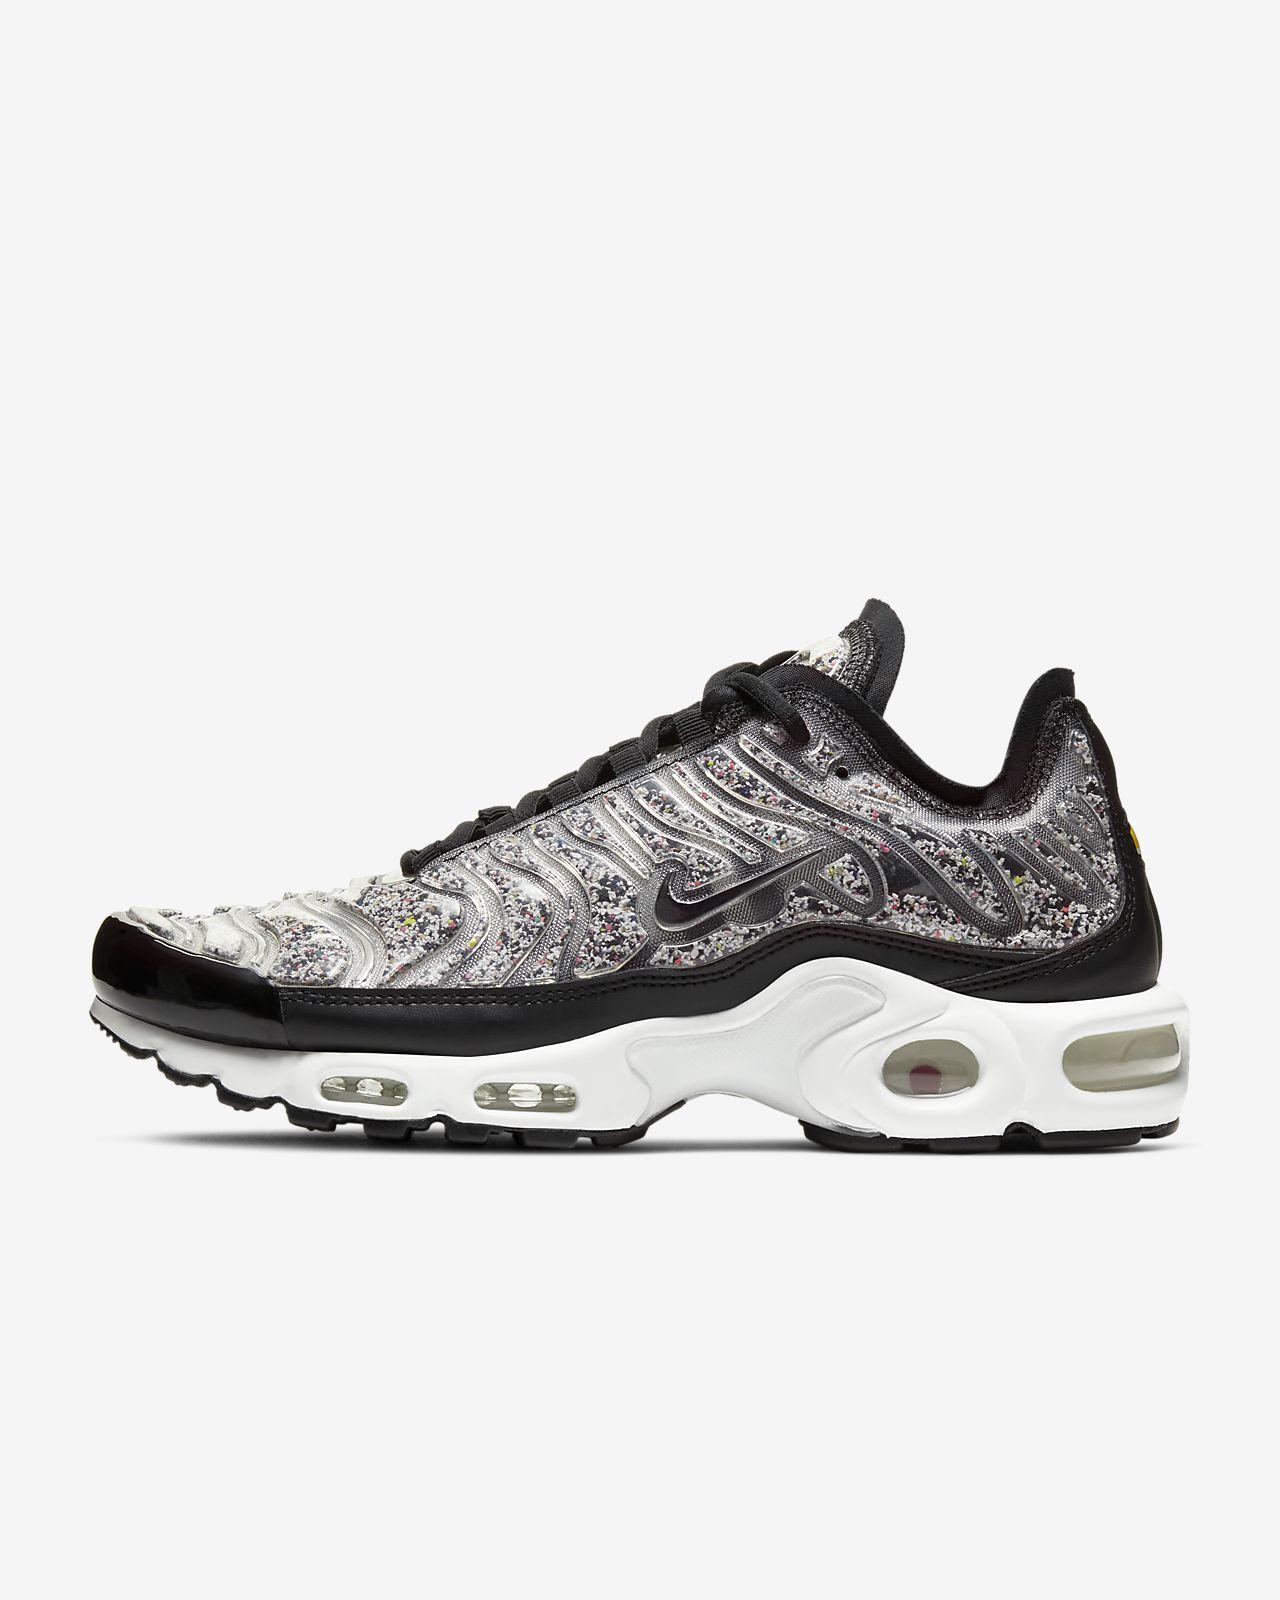 Chaussure Nike Air Max Plus LX pour Femme